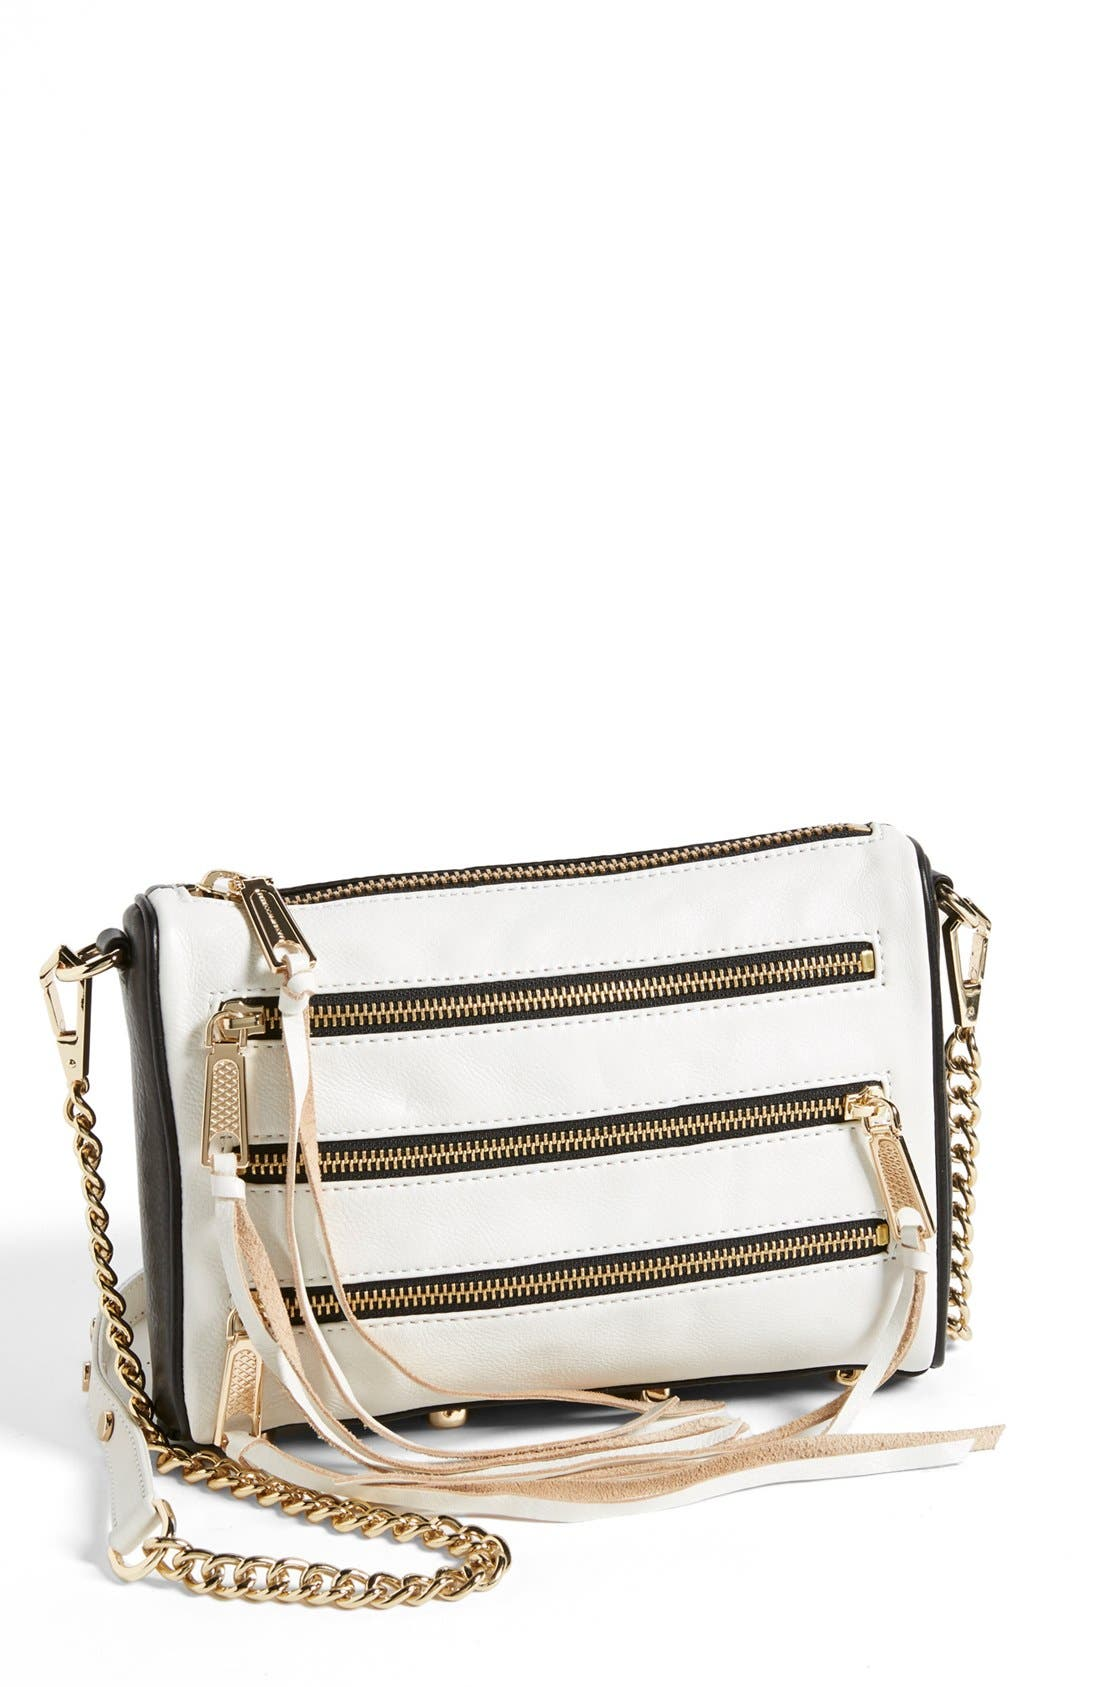 Alternate Image 1 Selected - Rebecca Minkoff '5 Zip - Mini' Two-Tone Leather Crossbody Bag